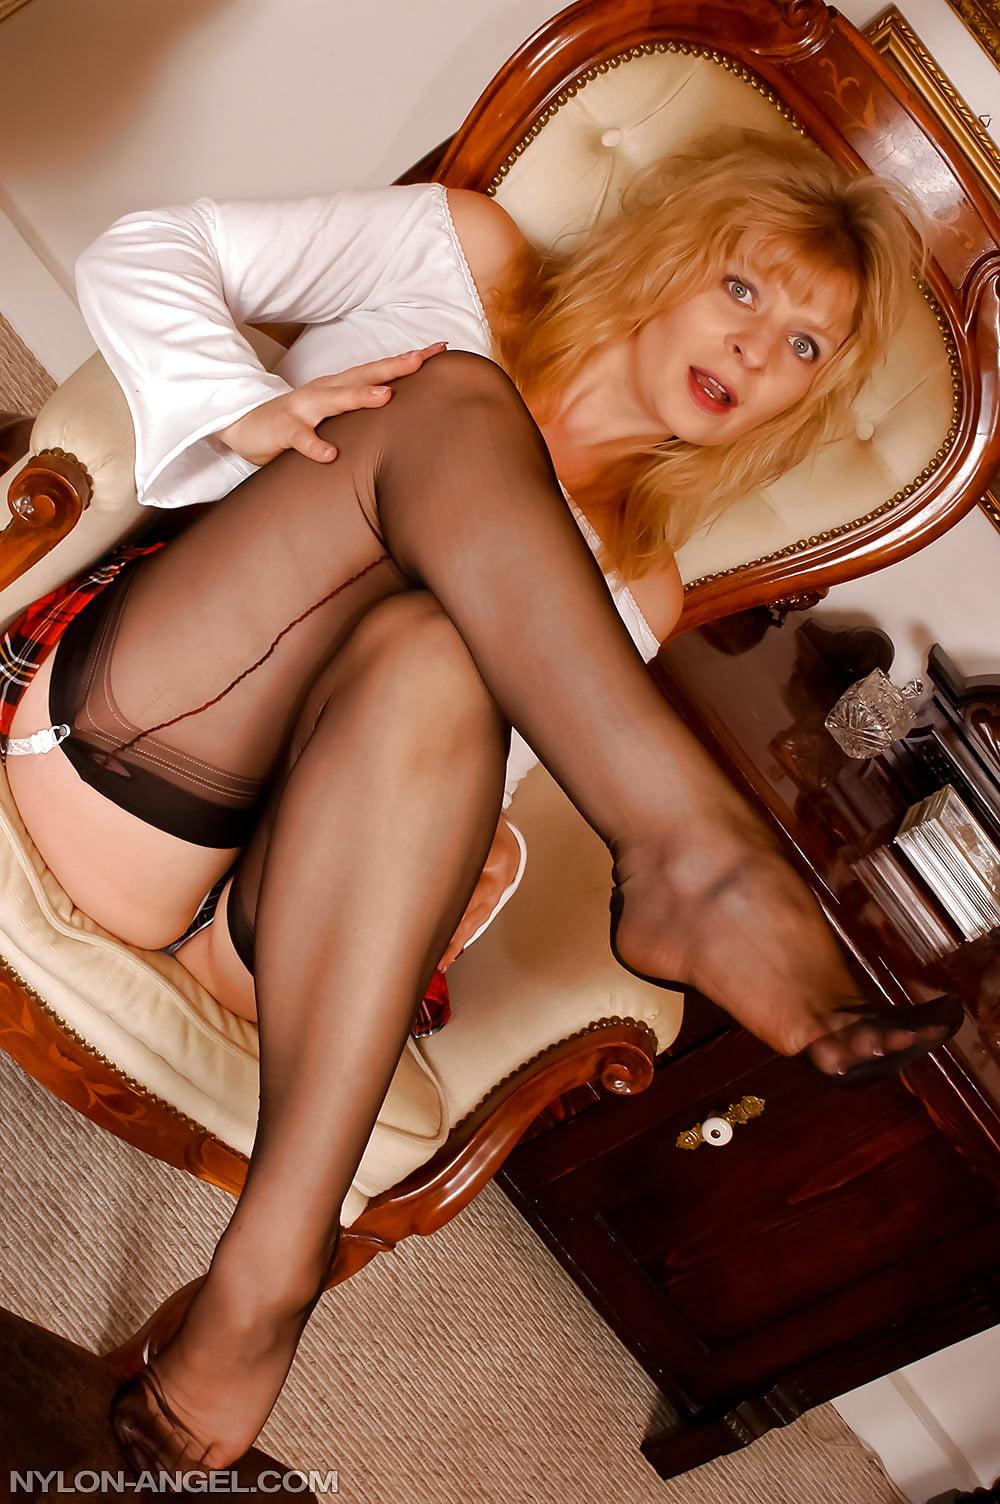 XXX Sex Photos Pakistni nude girls piss